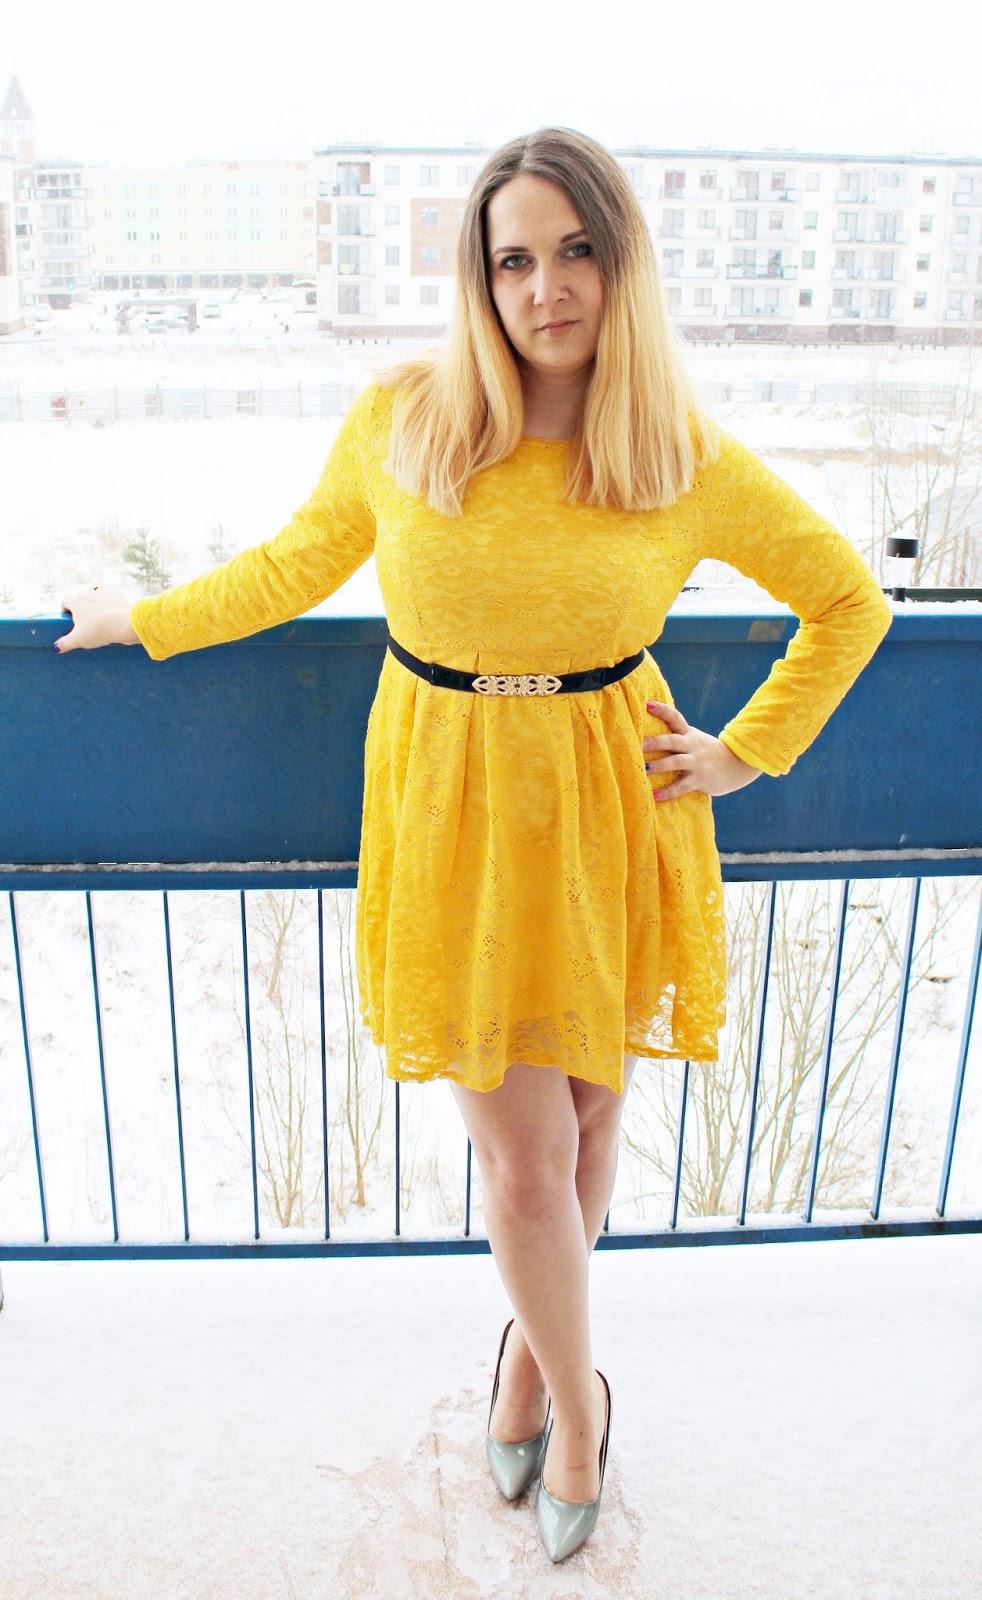 Kanarkowa sukienka i szpilki ombre - GAMISS